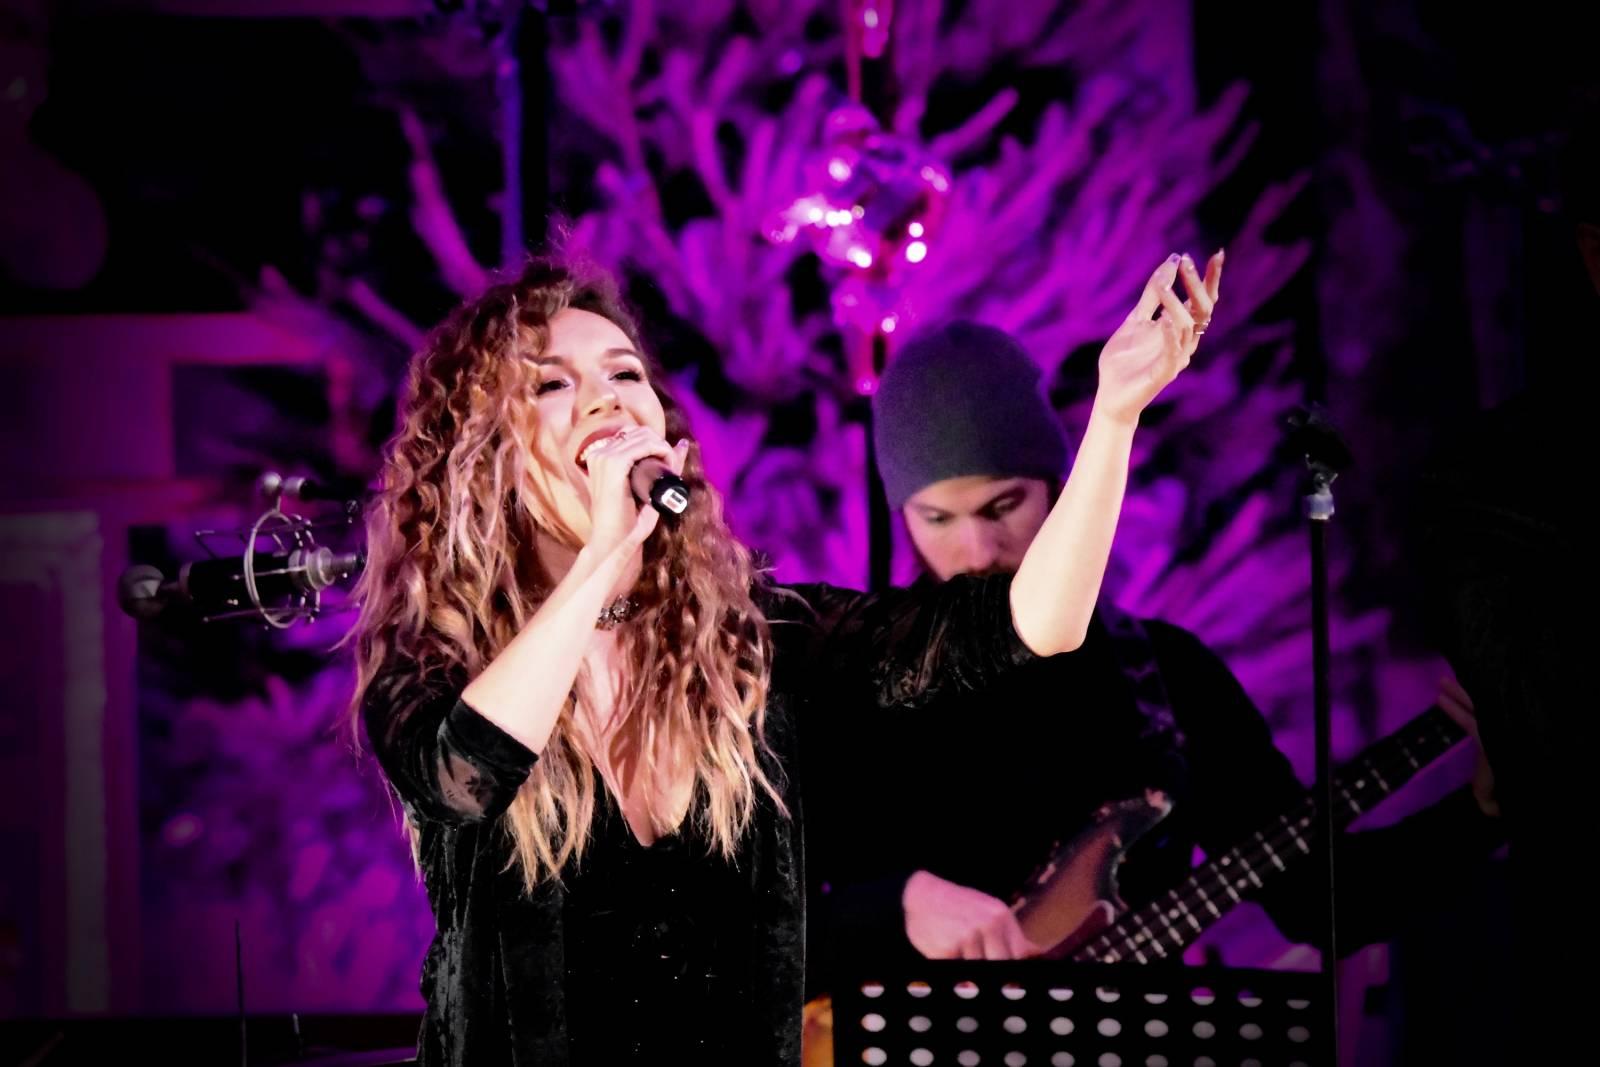 Dunja artiest zangeres livemuziek house of events (2)